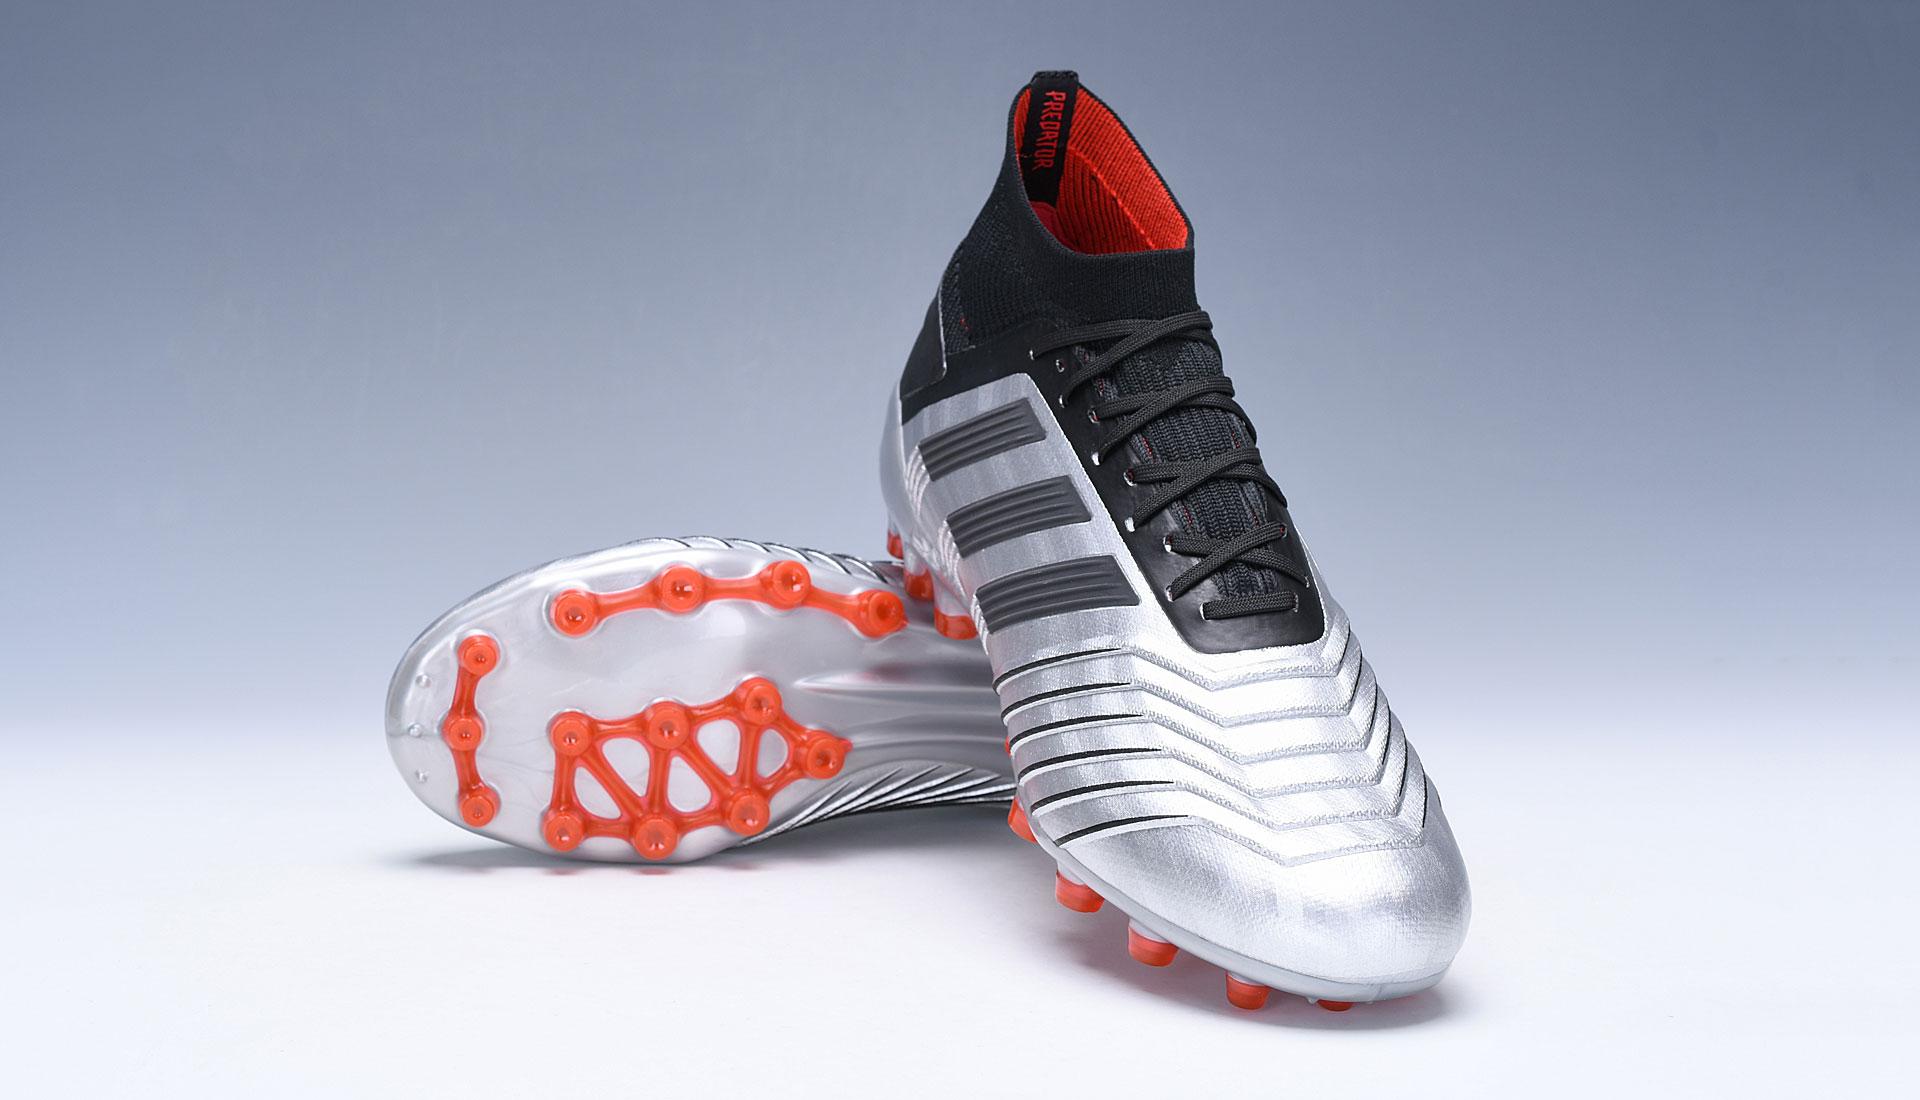 adidas Predator 19.1 AG Silver Red Football Boots Upper